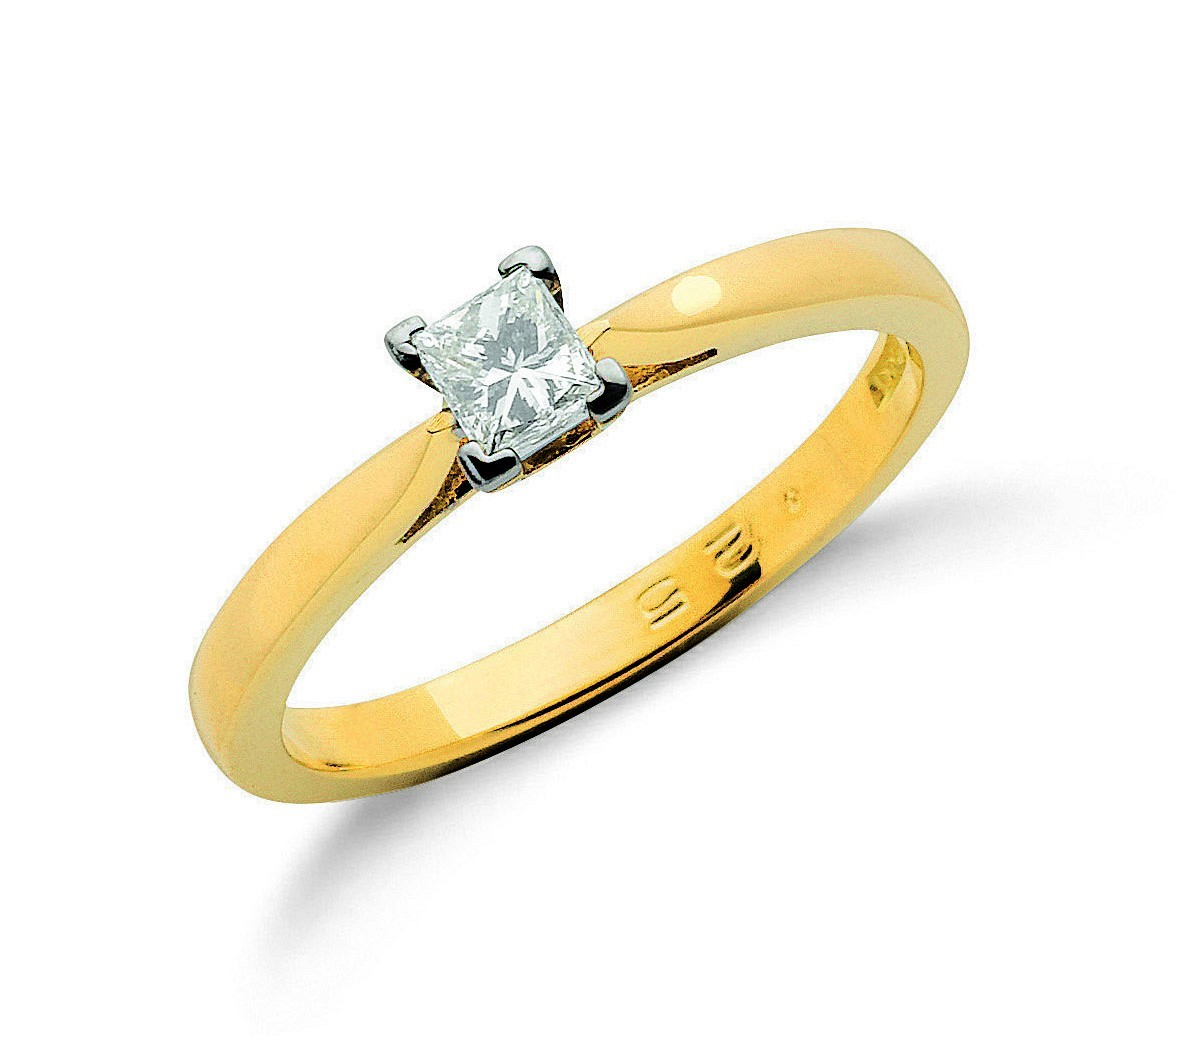 18ct Yellow Gold 0.25ct Princess Cut Diamond Engagement Ring